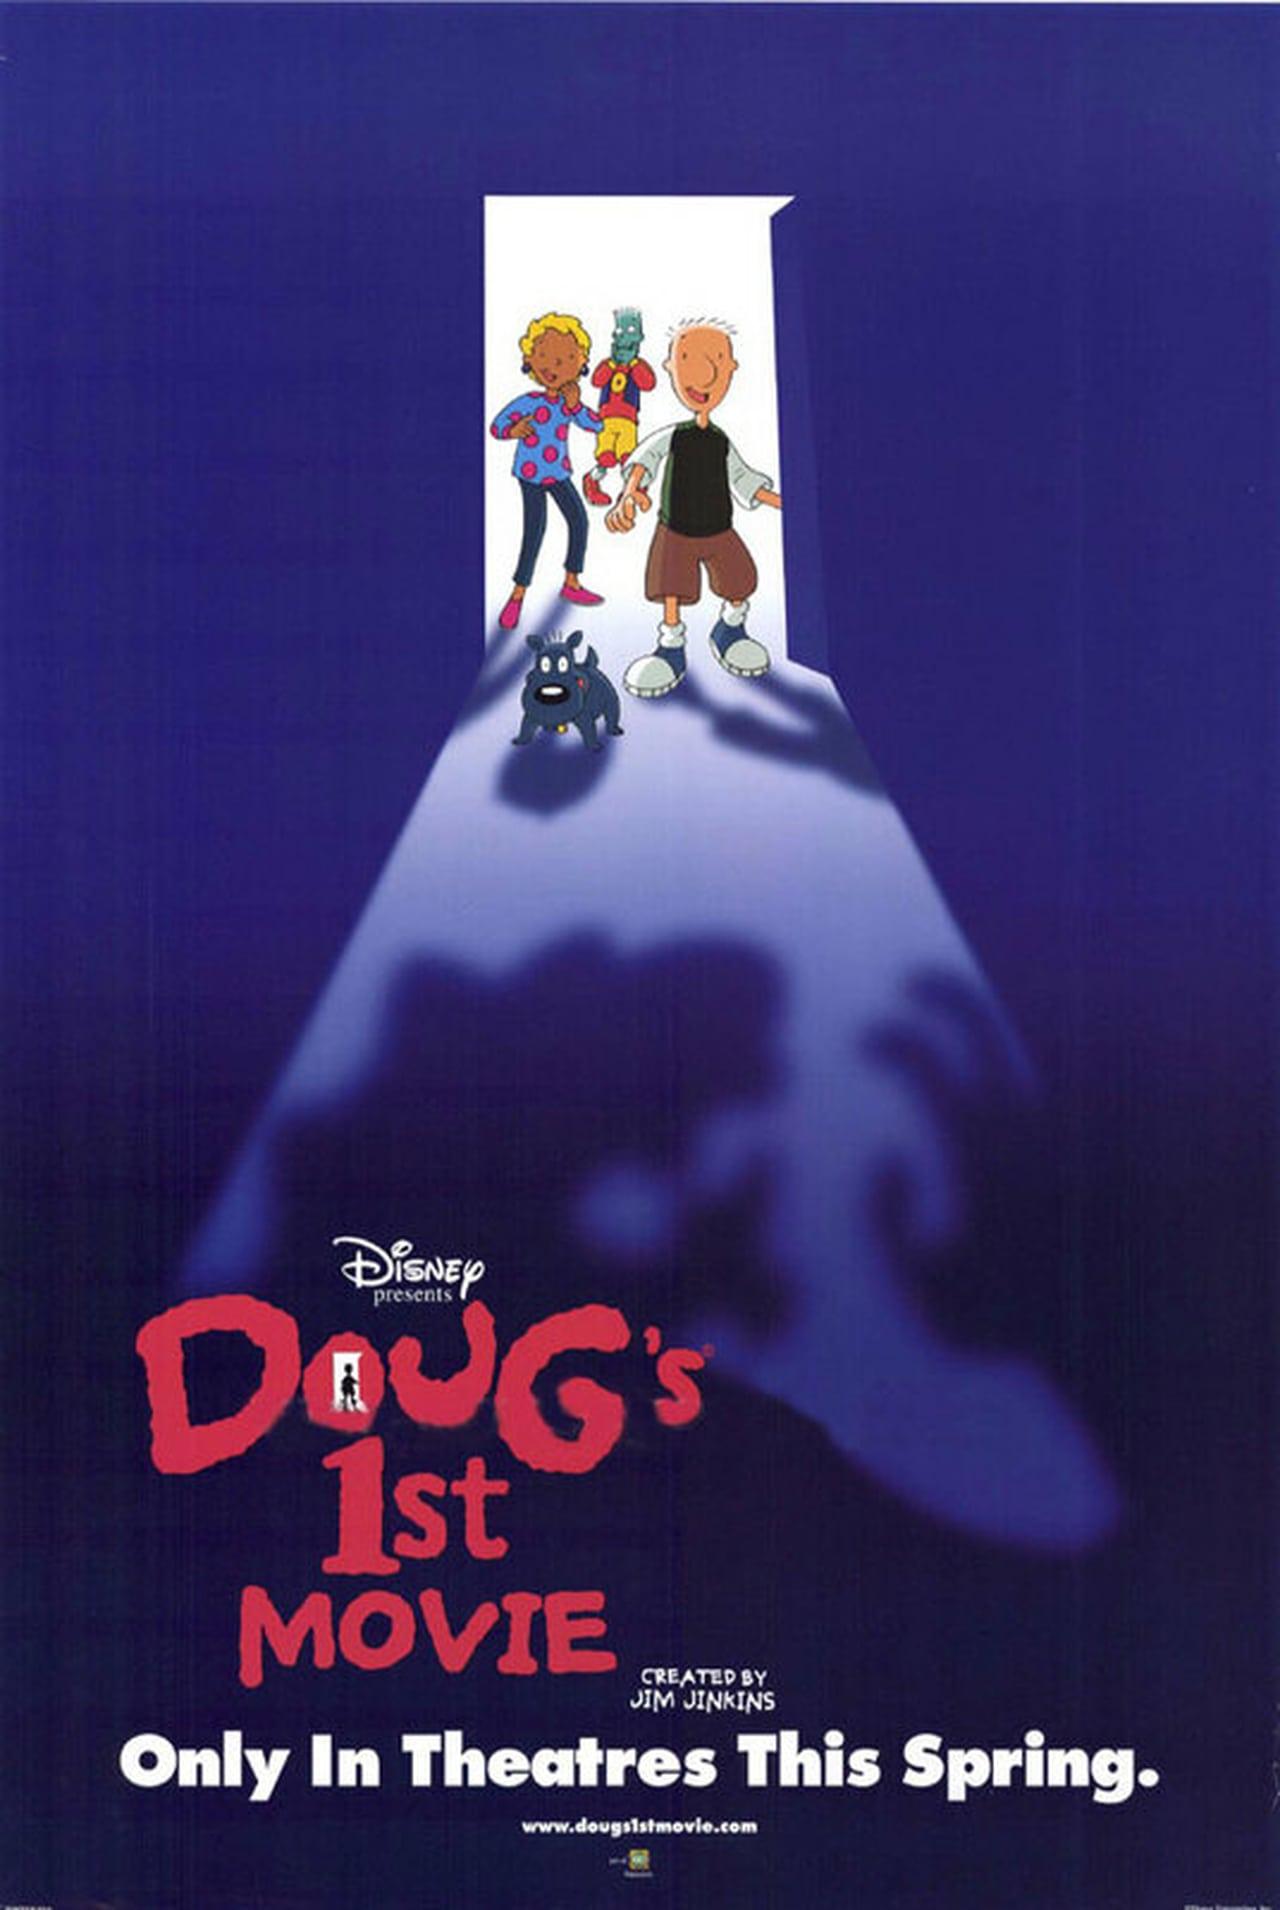 Doug's 1st Movie Poster